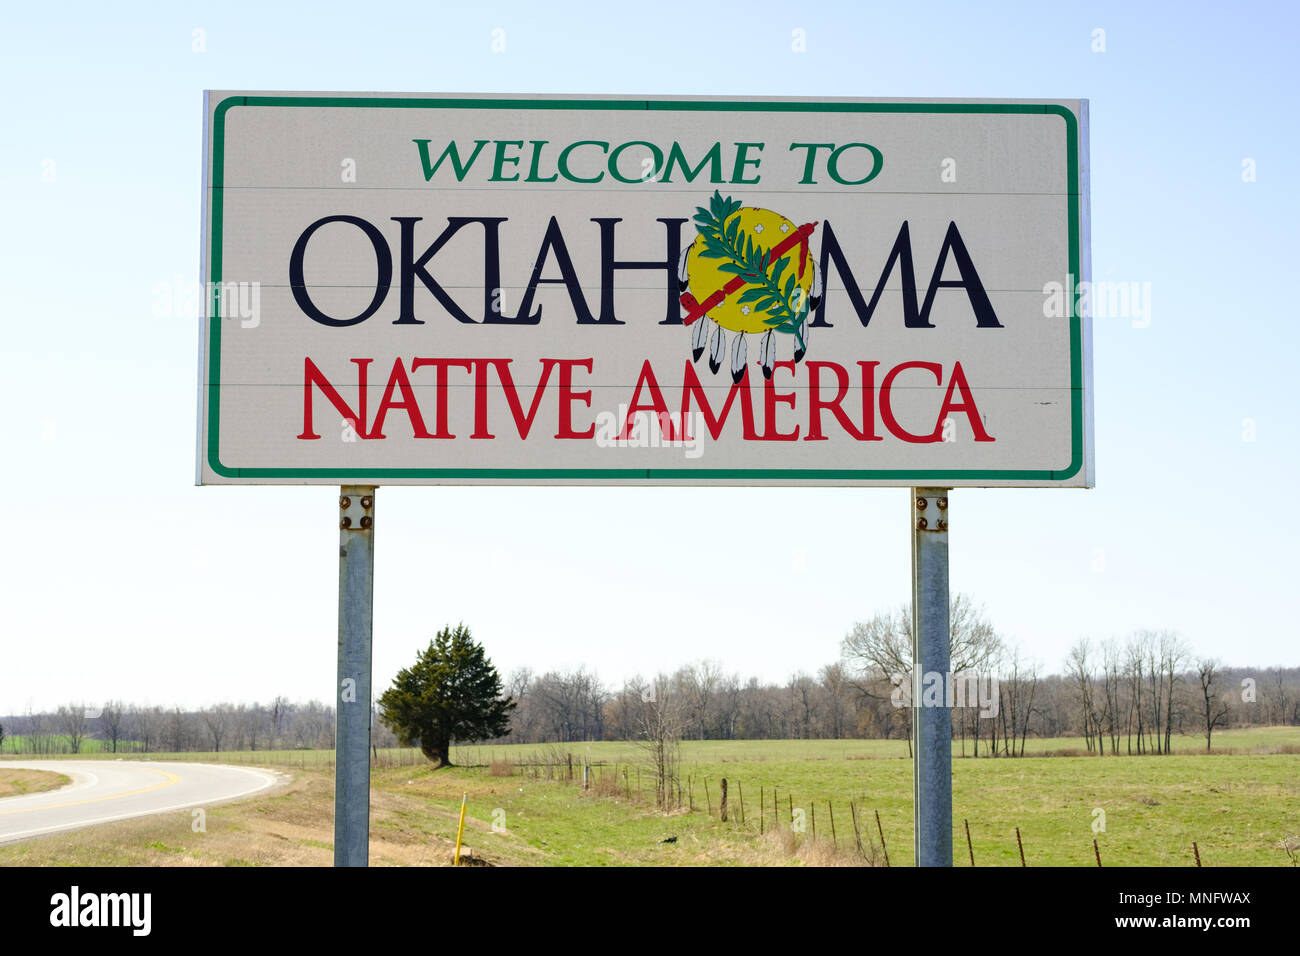 Welcome to Oklahoma Sign, Native America - Stock Image